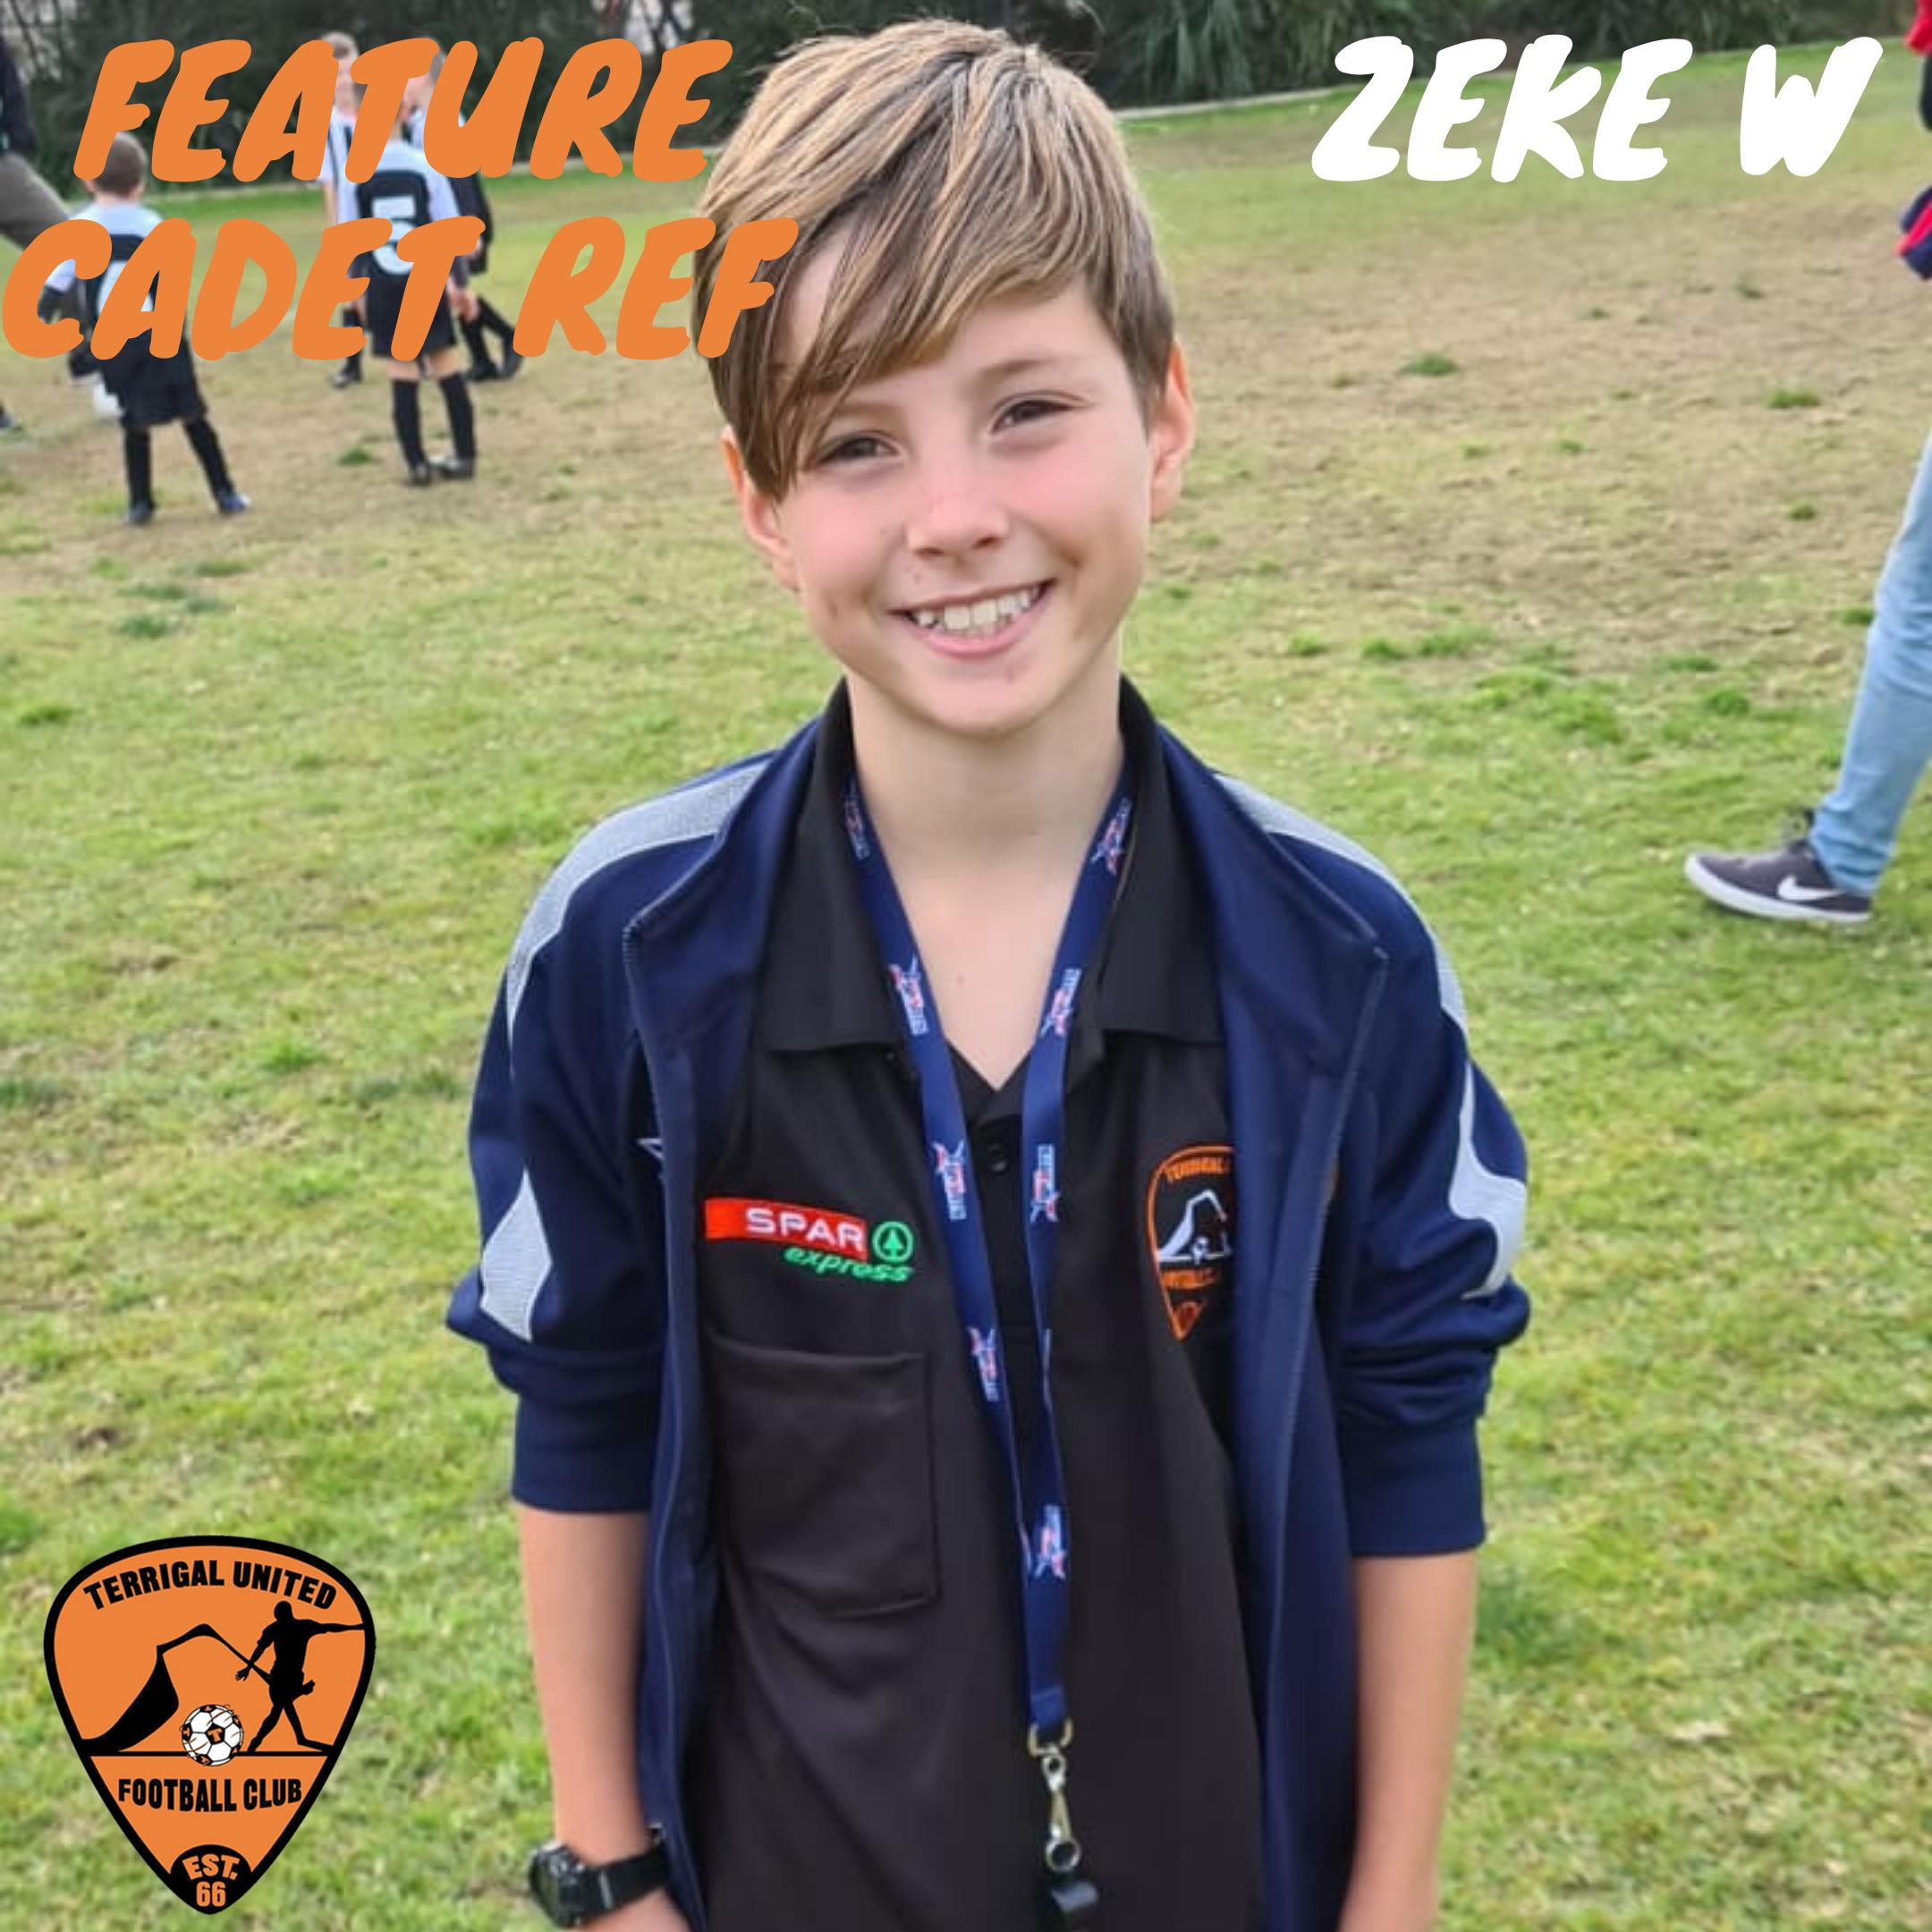 Feature Cadet Ref: Zeke W